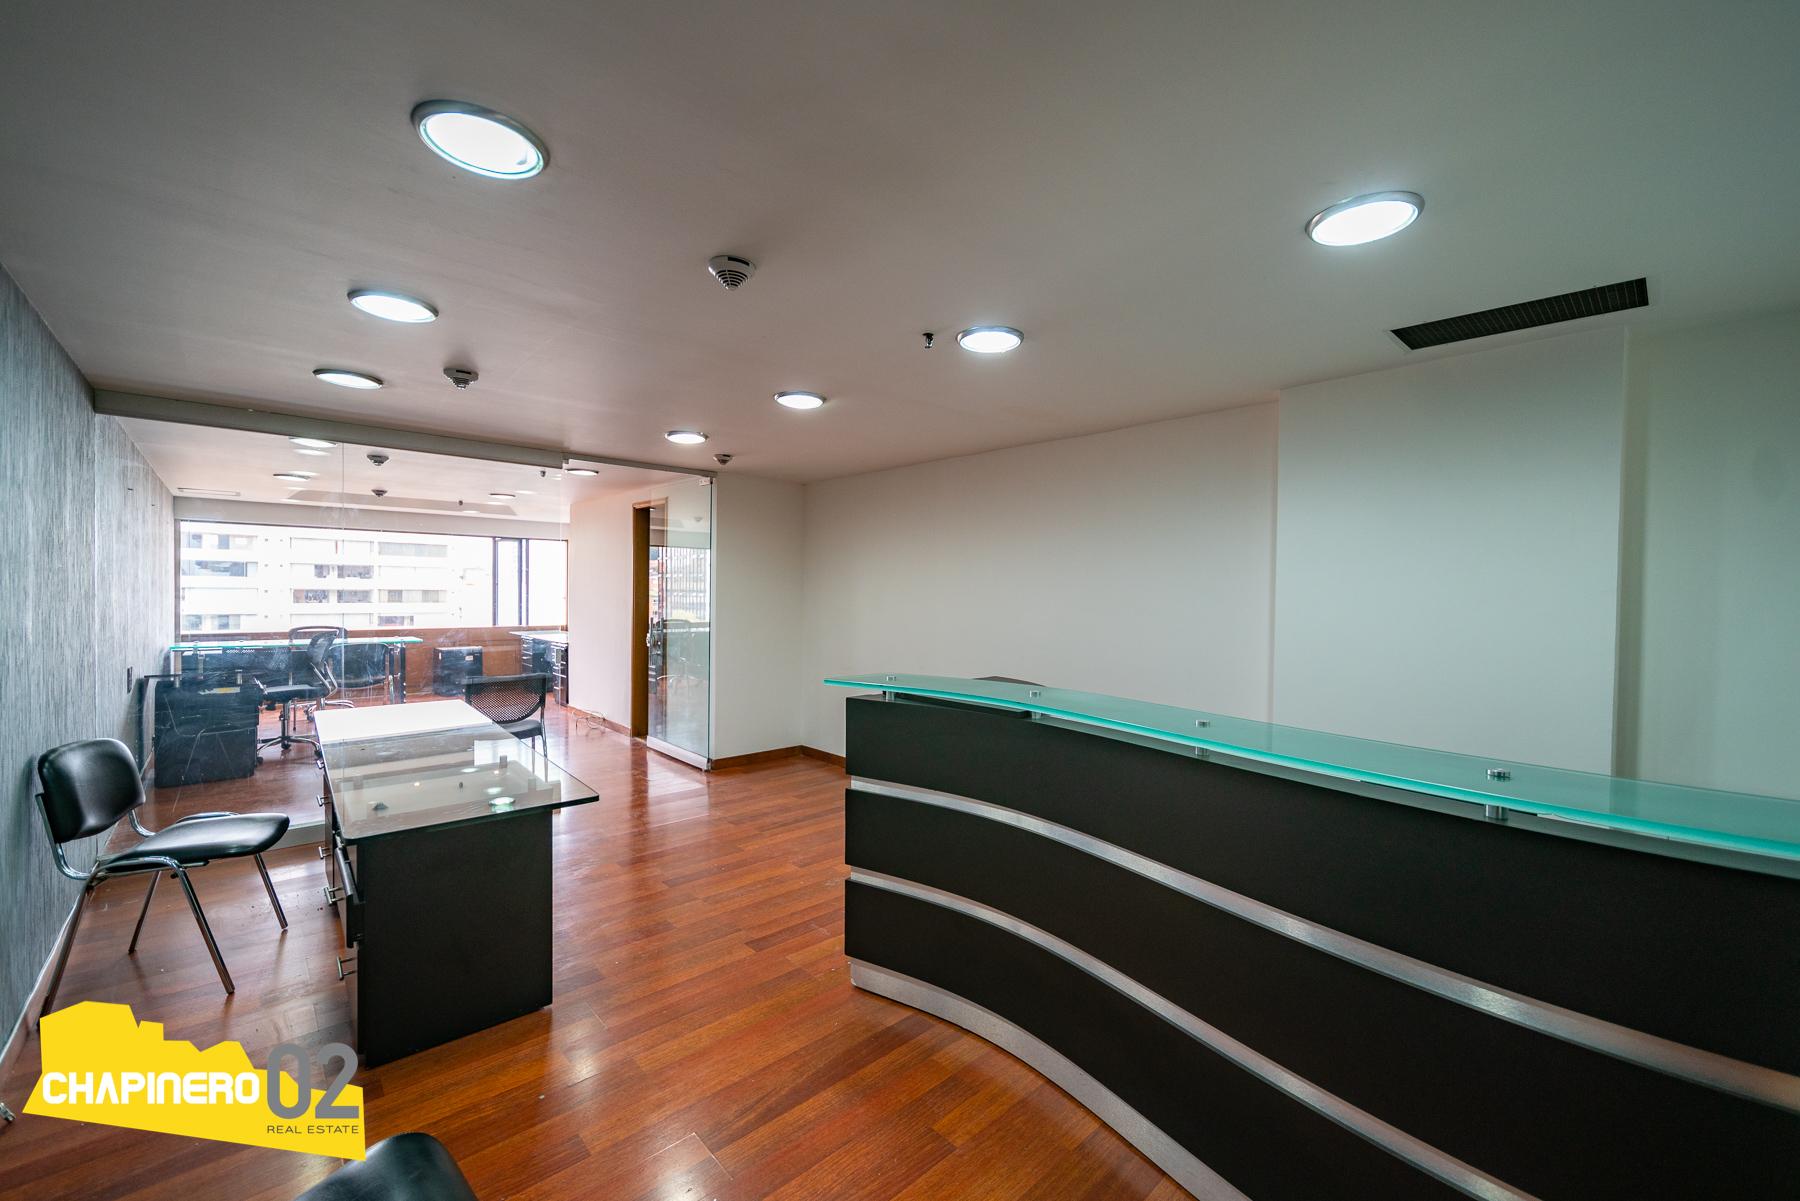 Oficina Amoblada :: 51 m² :: Chicó Reserv :: $3,1M